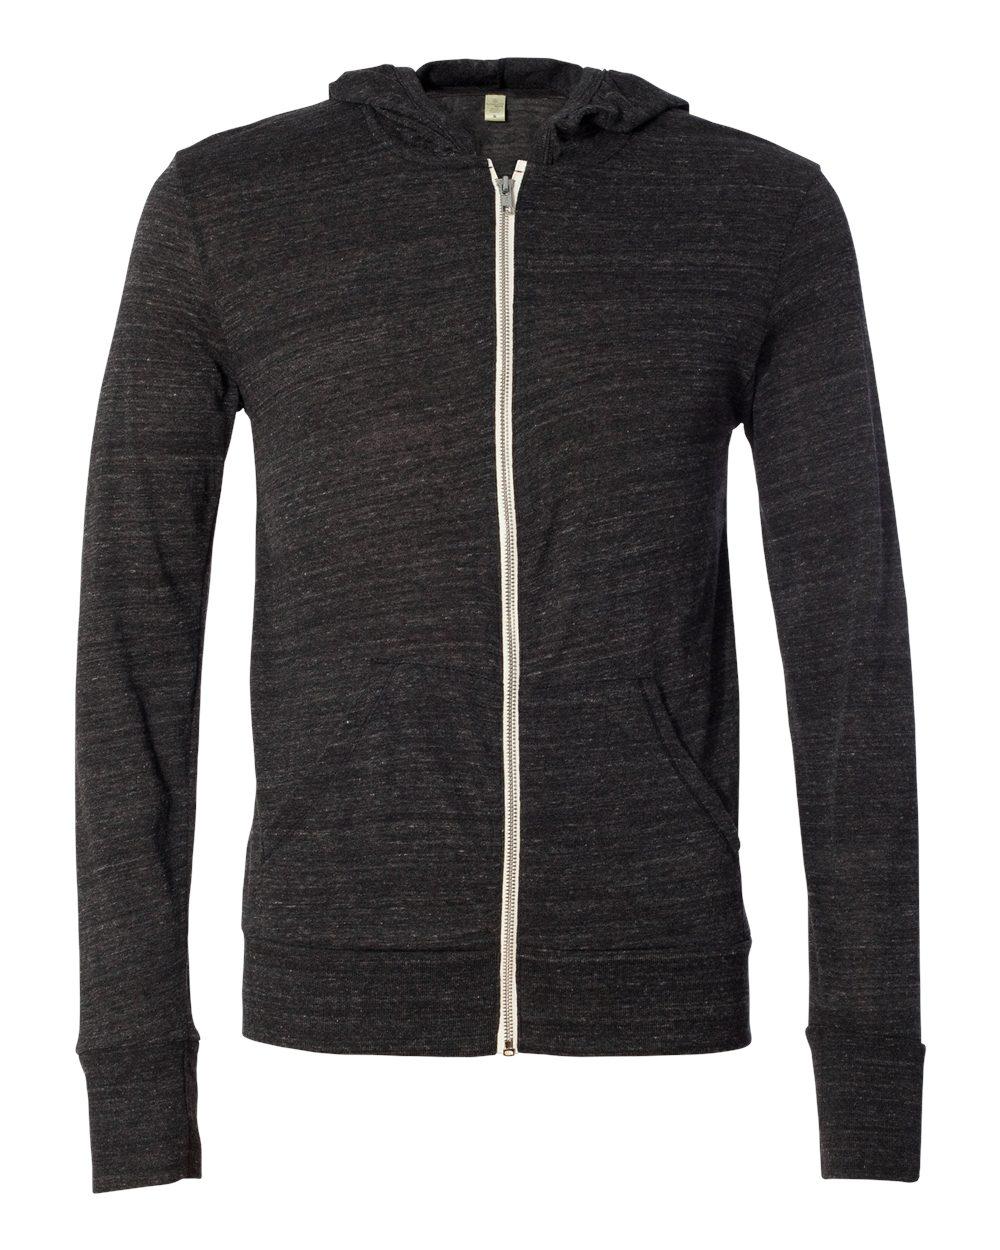 Alternative-Mens-Eco-Jersey-Hooded-Full-Zip-T-Shirt-Blank-Plain-1970e1-up-to-3XL miniature 6